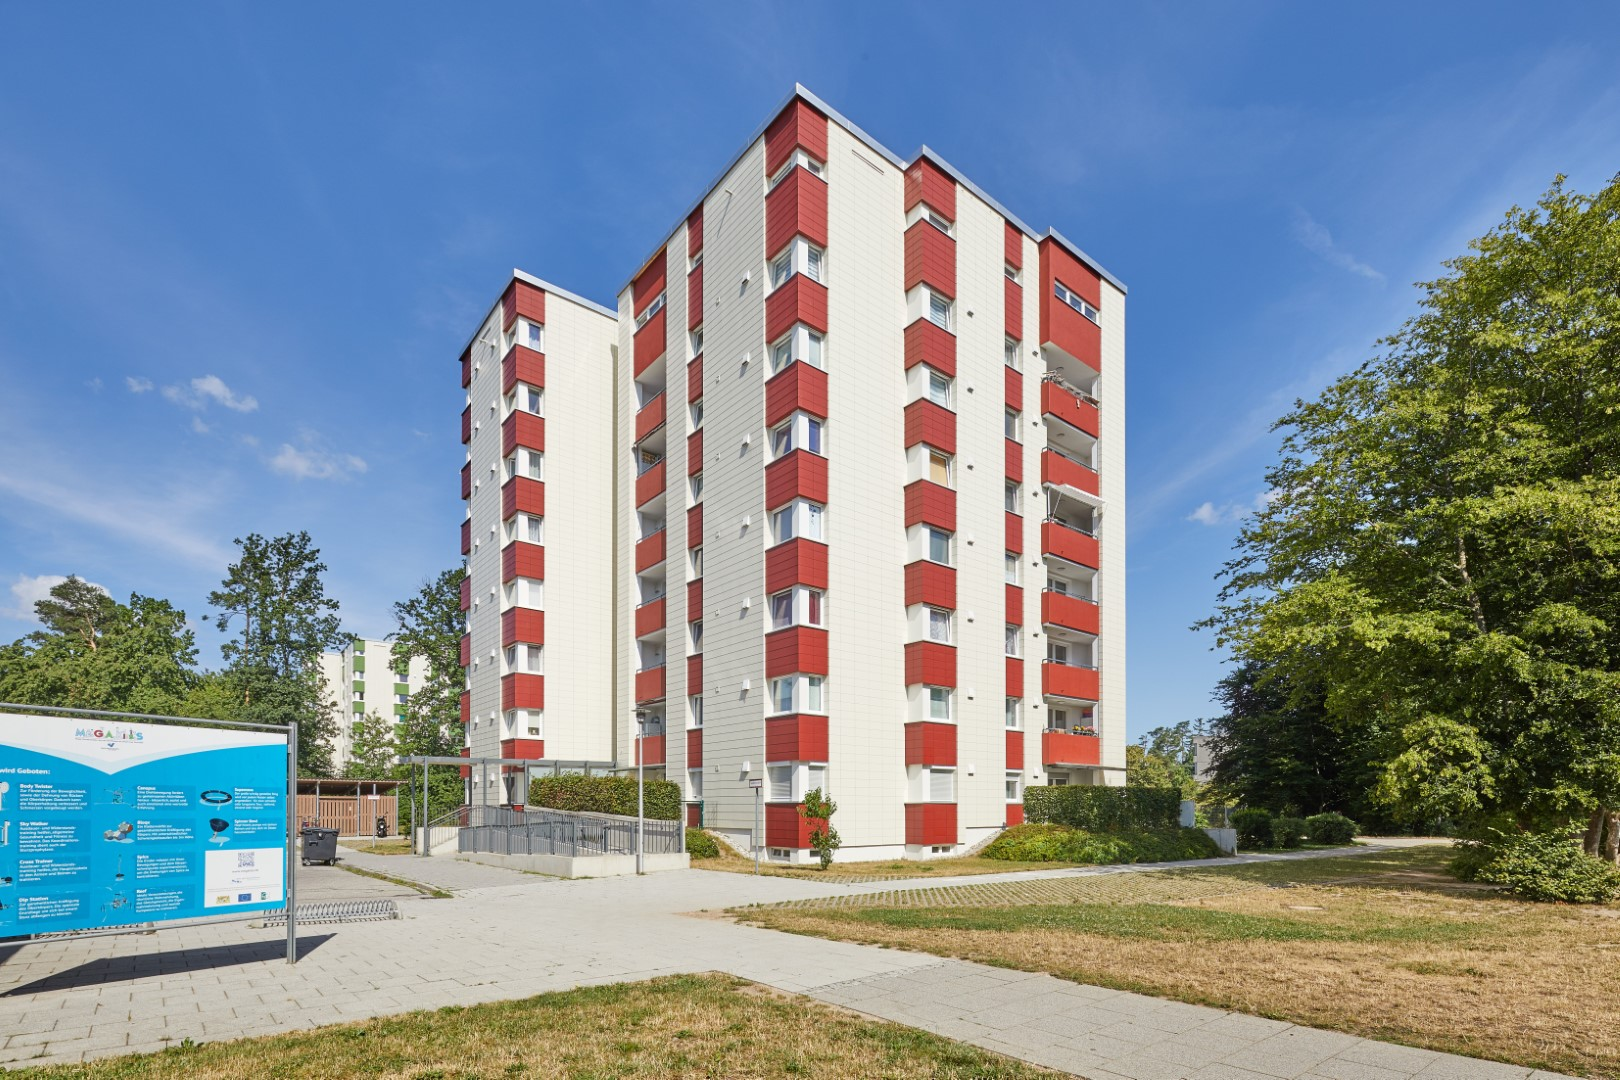 Richard-Wagner-Straße 29